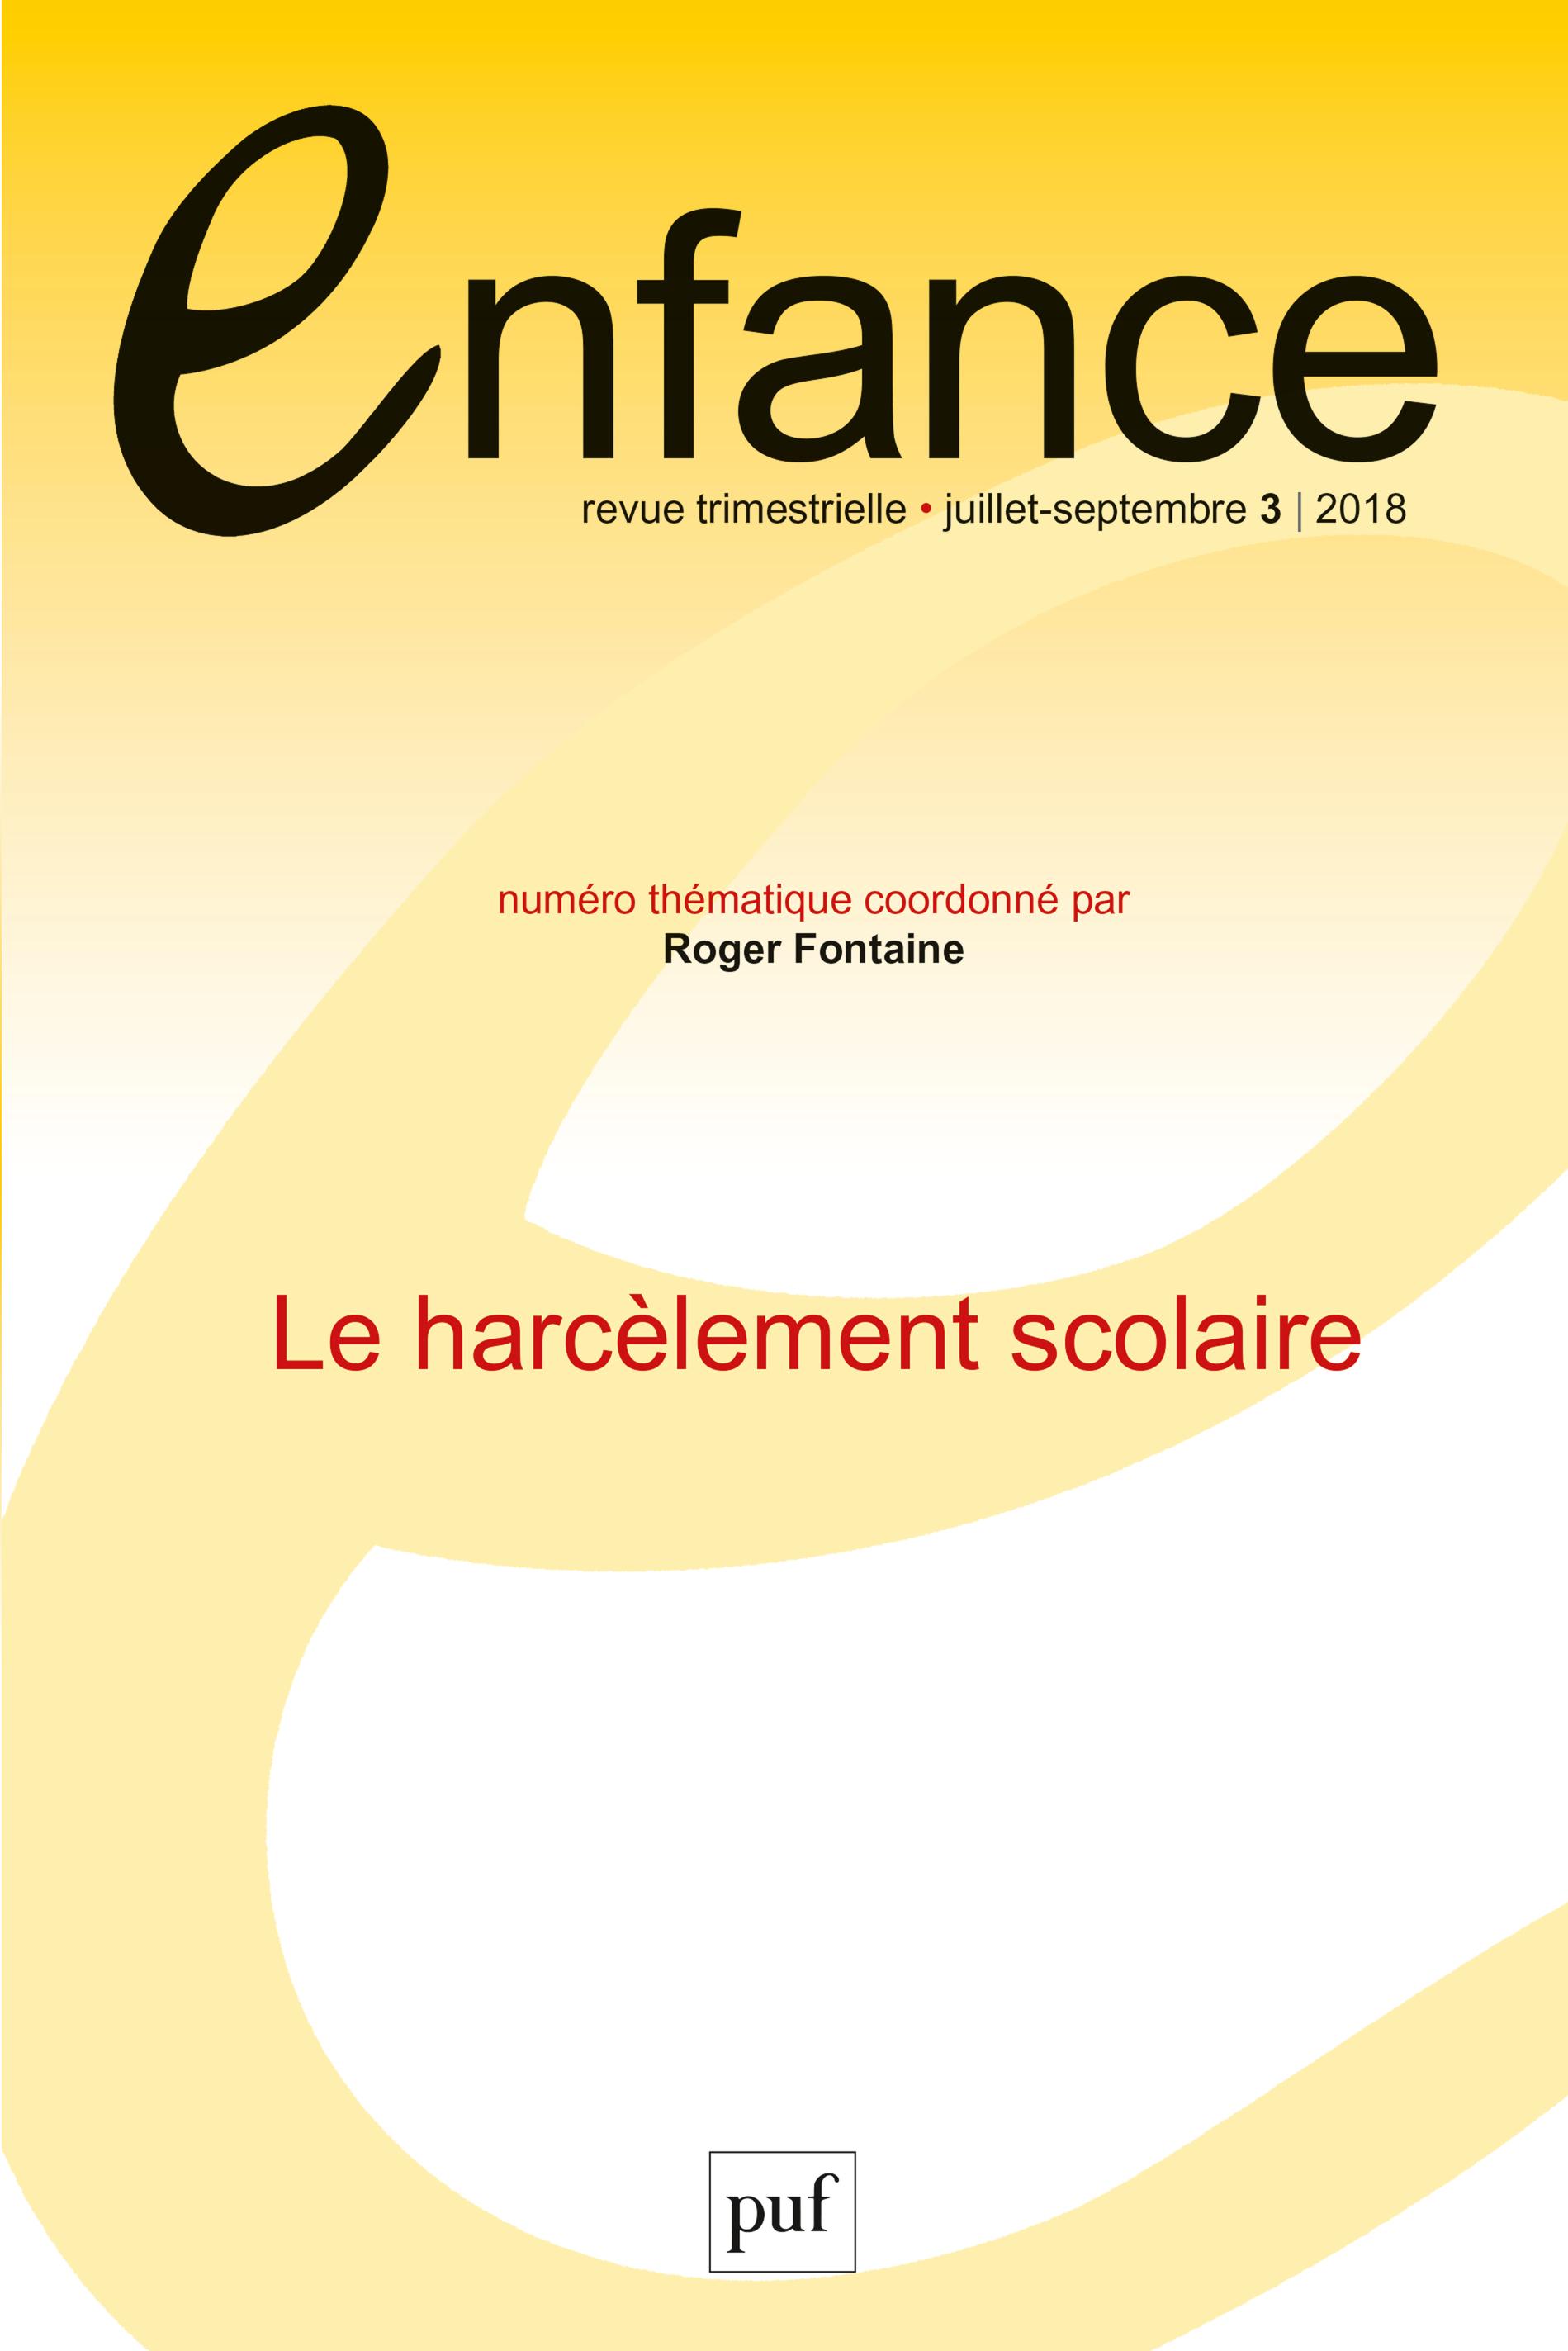 ENFANCE 2018 - 3